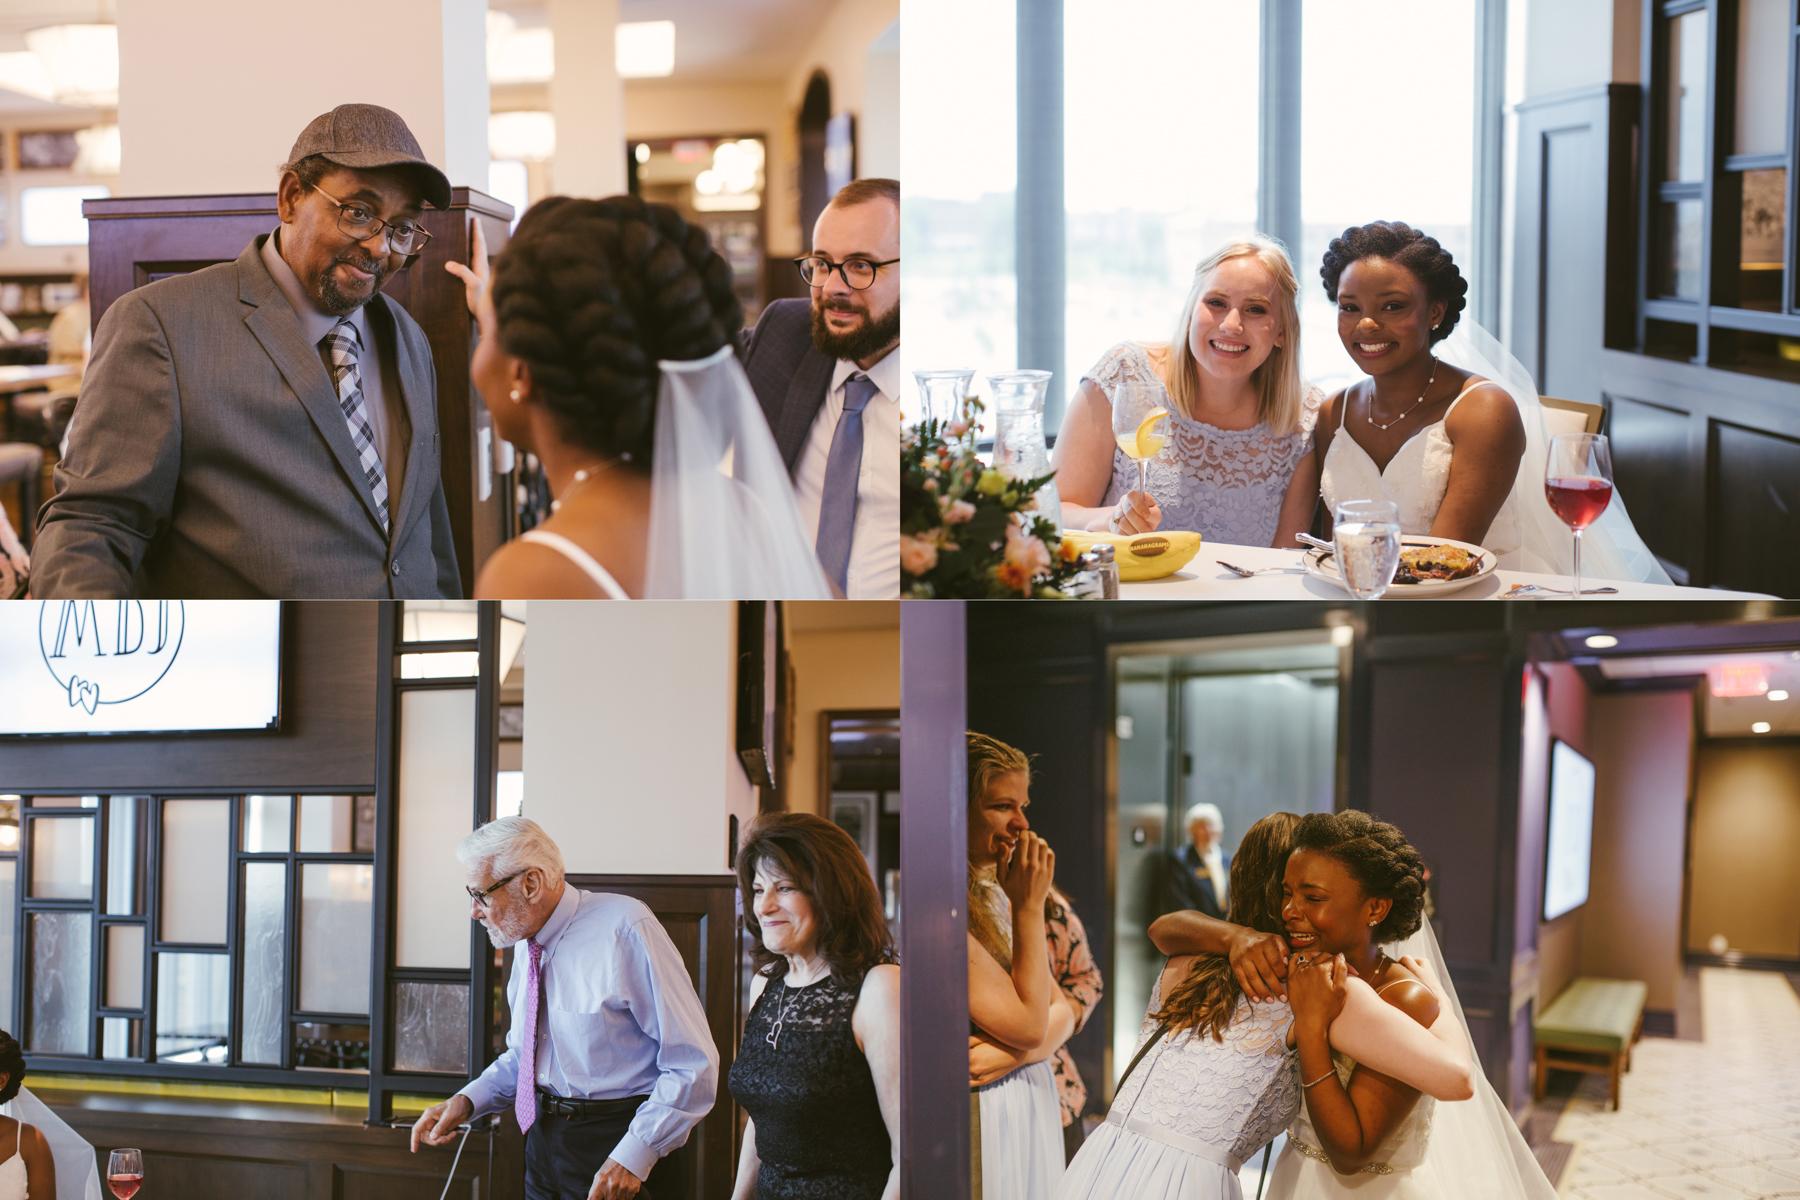 030 may-jimmy-notre-dame-wedding.jpg